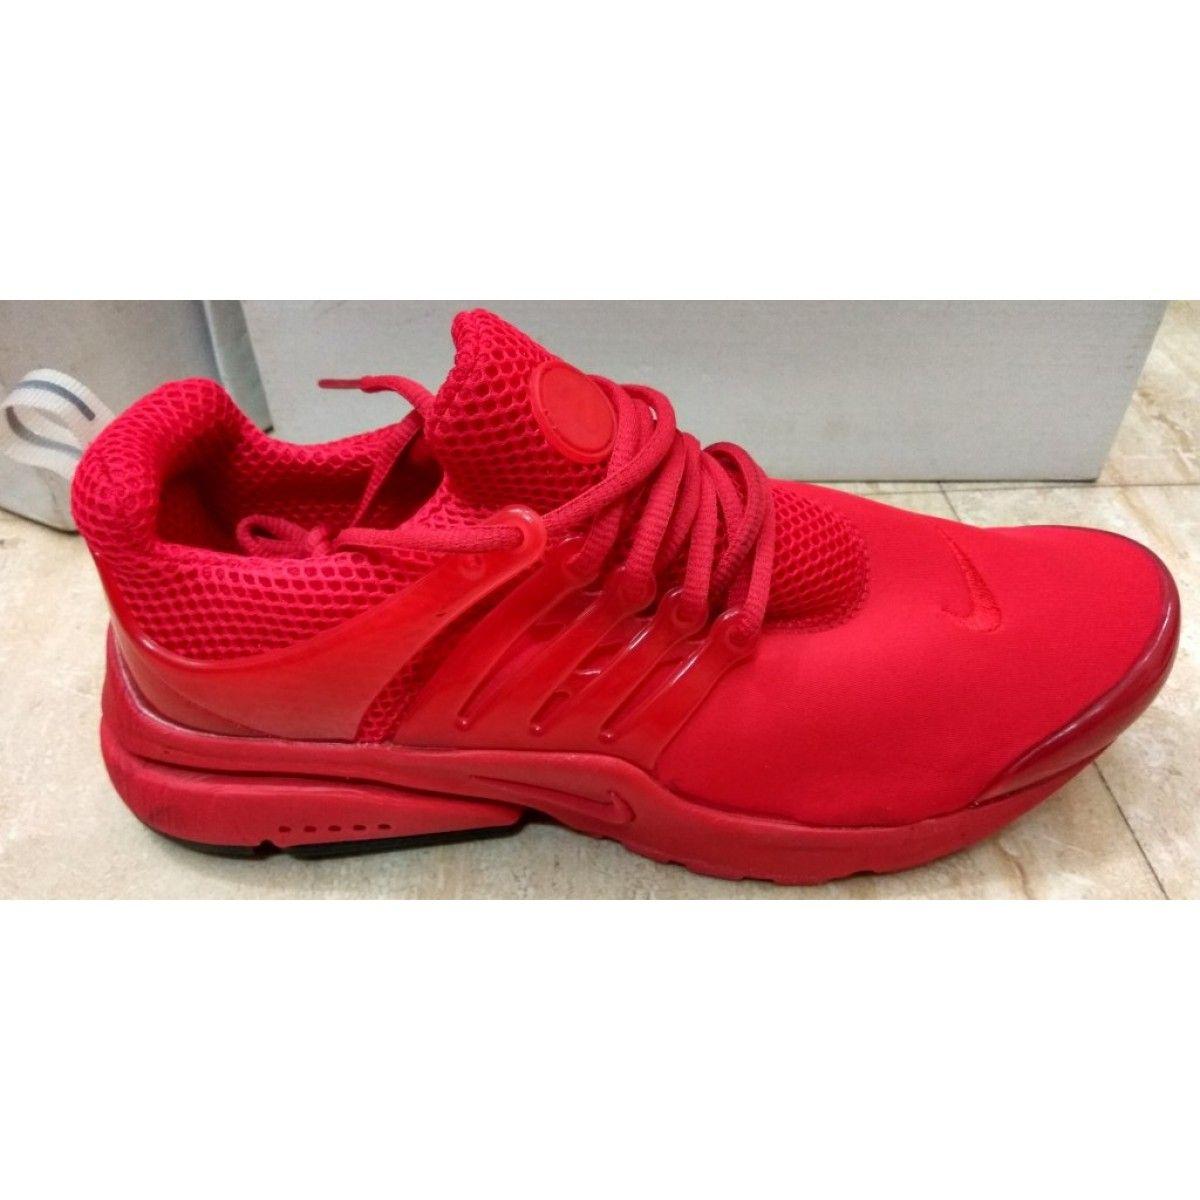 new styles 8a3fa d61ba Nike Air Presto Red